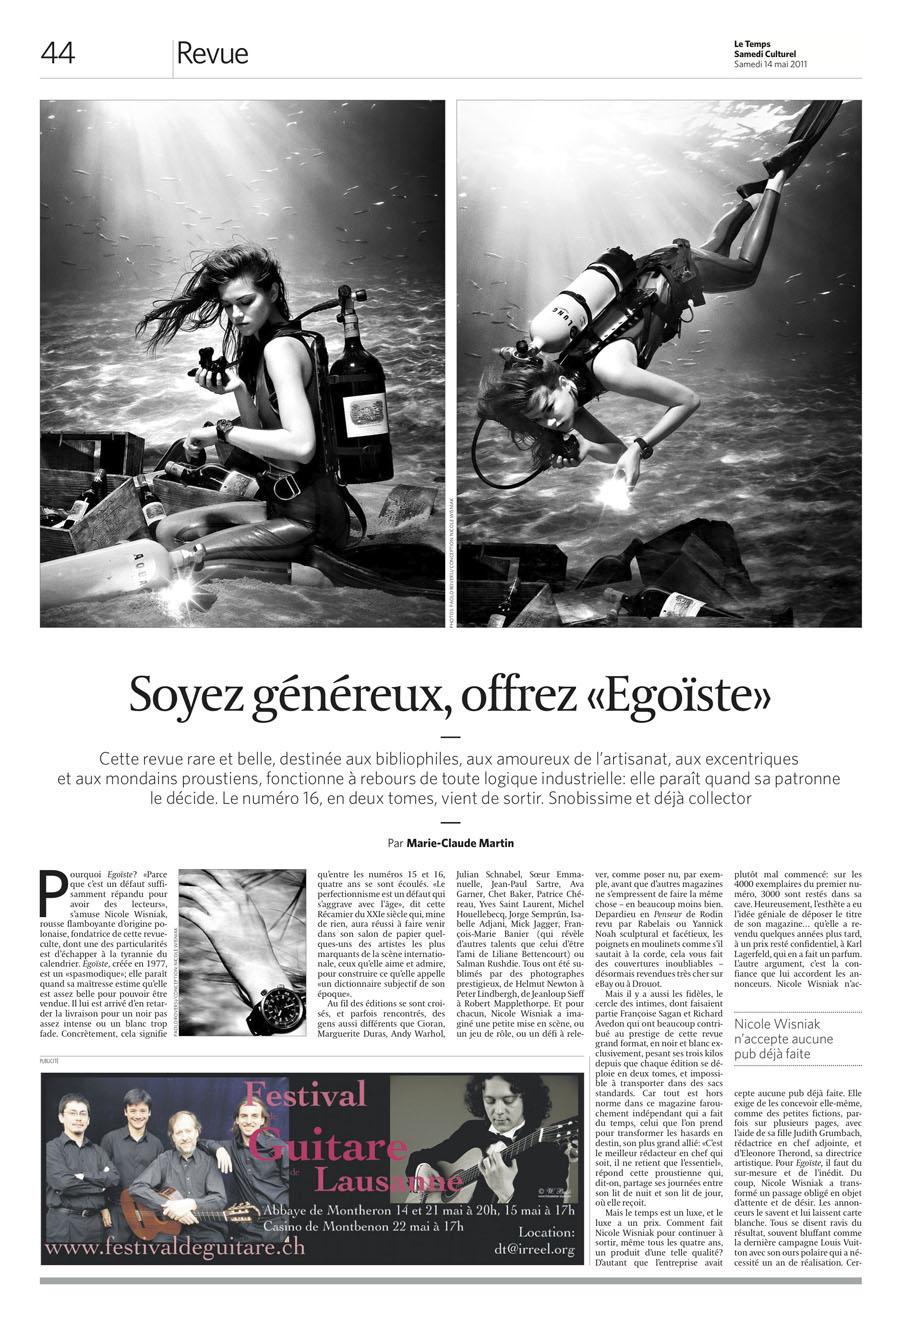 Le temps de Geneve 1.jpg